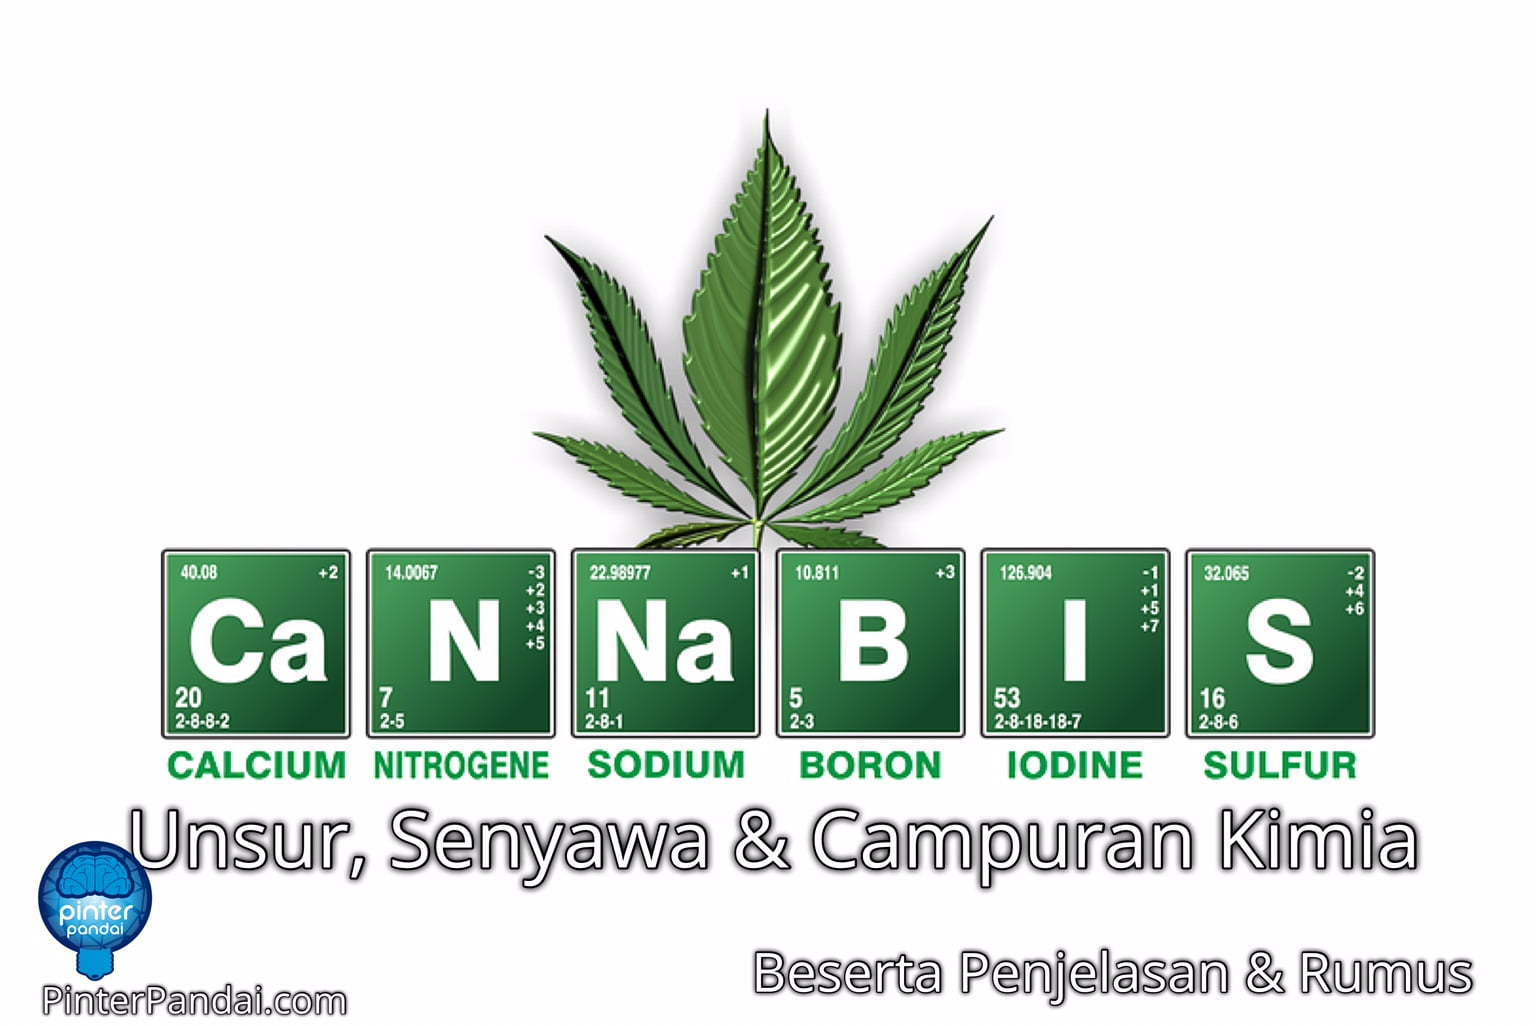 Unsur, Senyawa dan Campuran Kimia